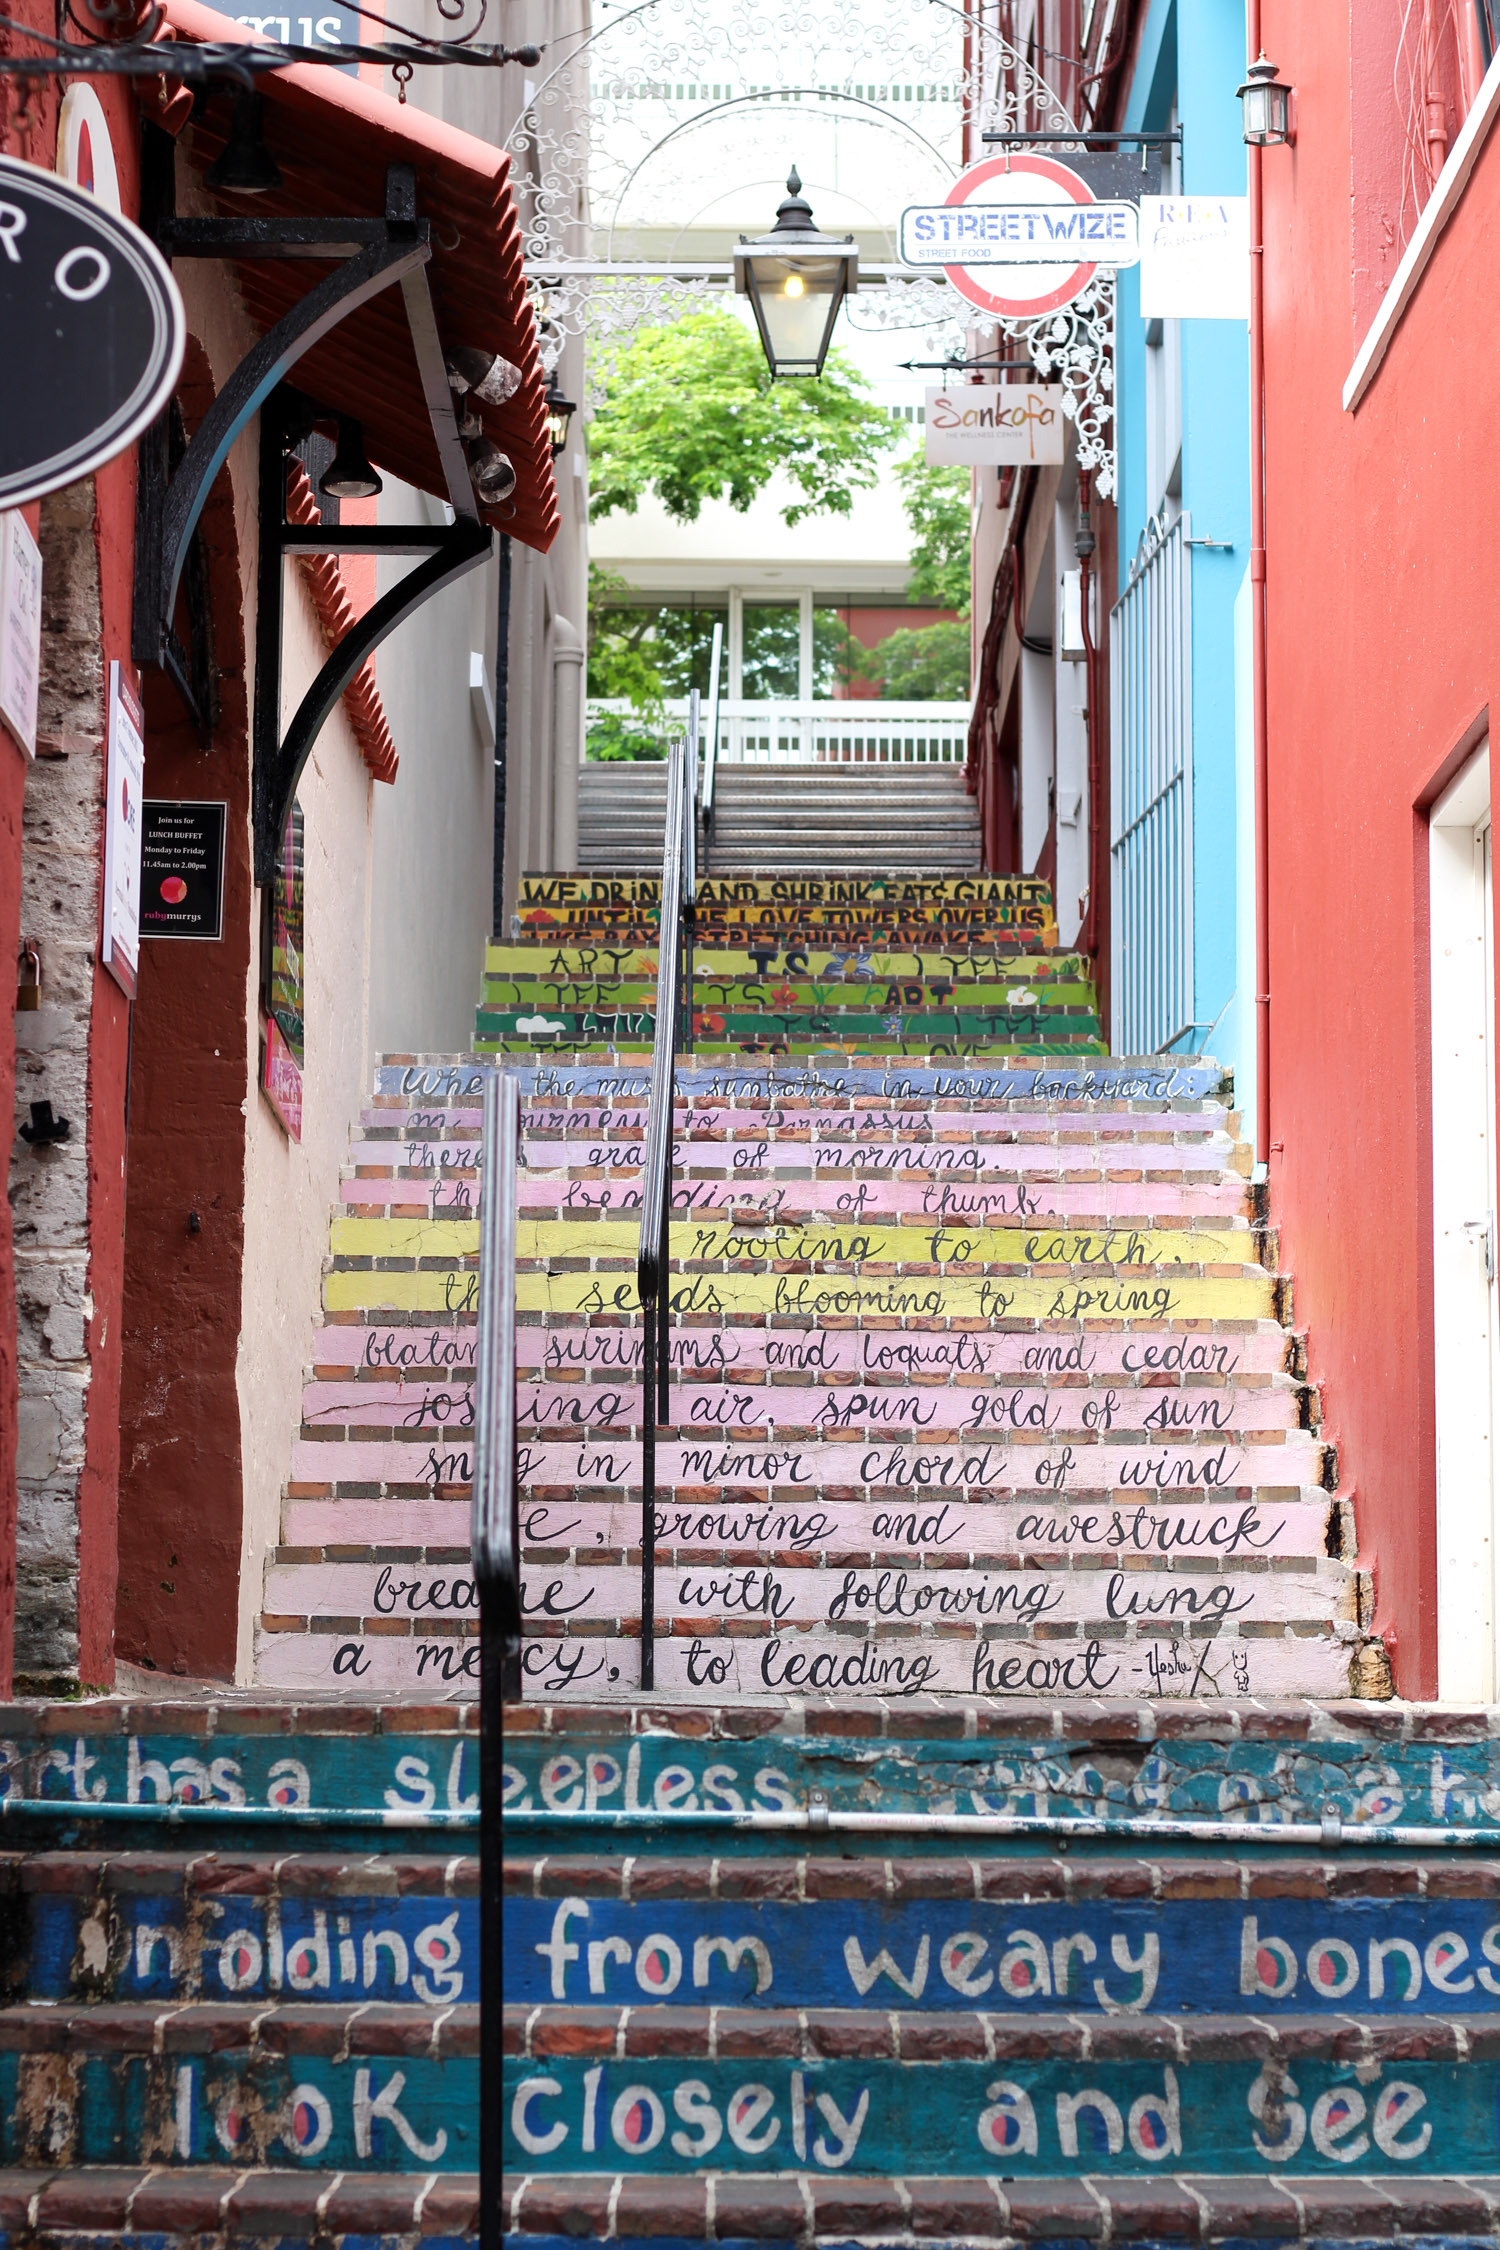 Downtown Hamilton Bermuda | Bermuda travel guide featured by popular DC travel blogger, Monica Dutia